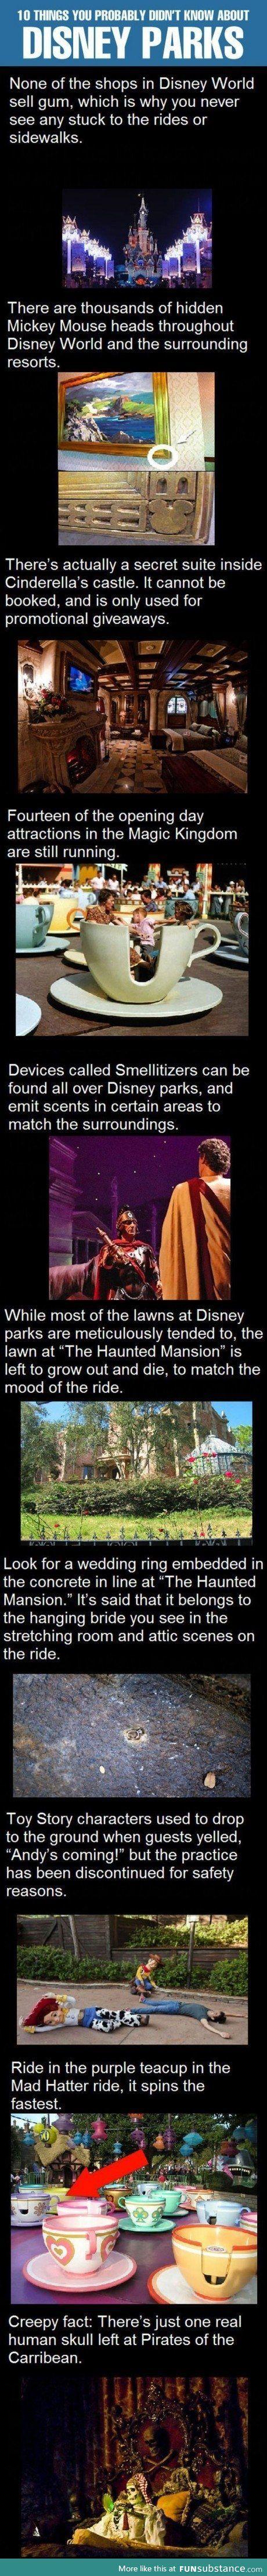 Disney world facts